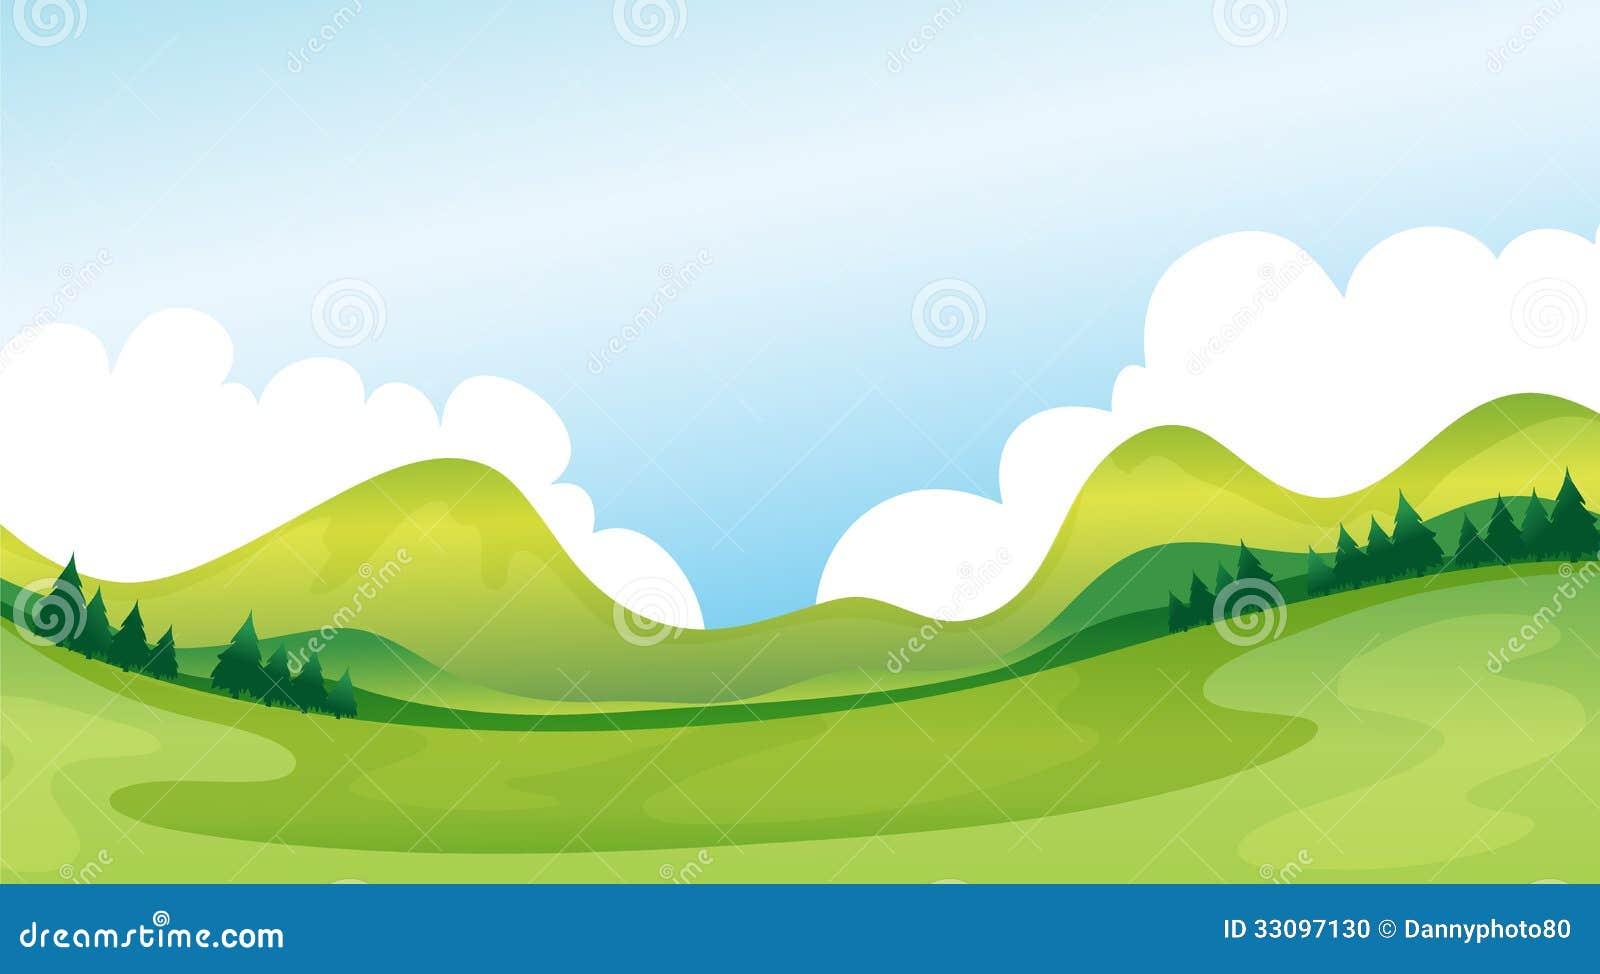 Un paysage vert photo stock image 33097130 for Paysage vert